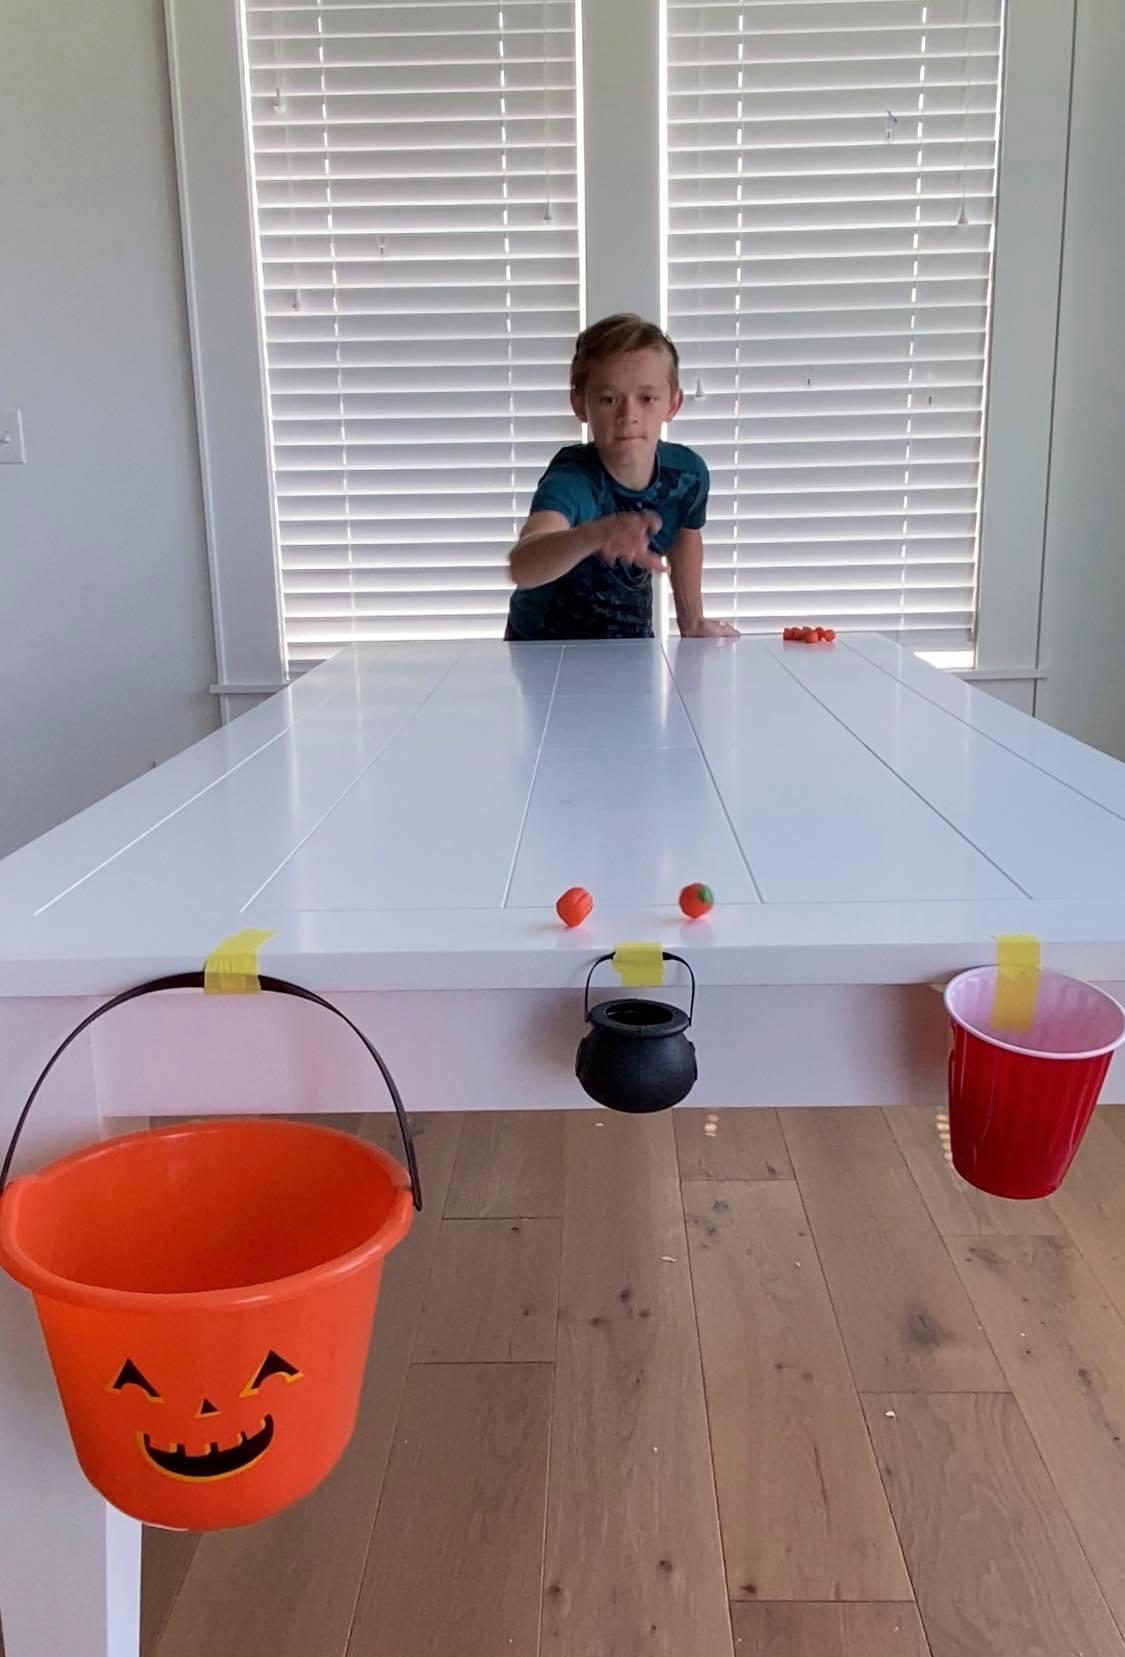 Kid sliding pumpkins across a table